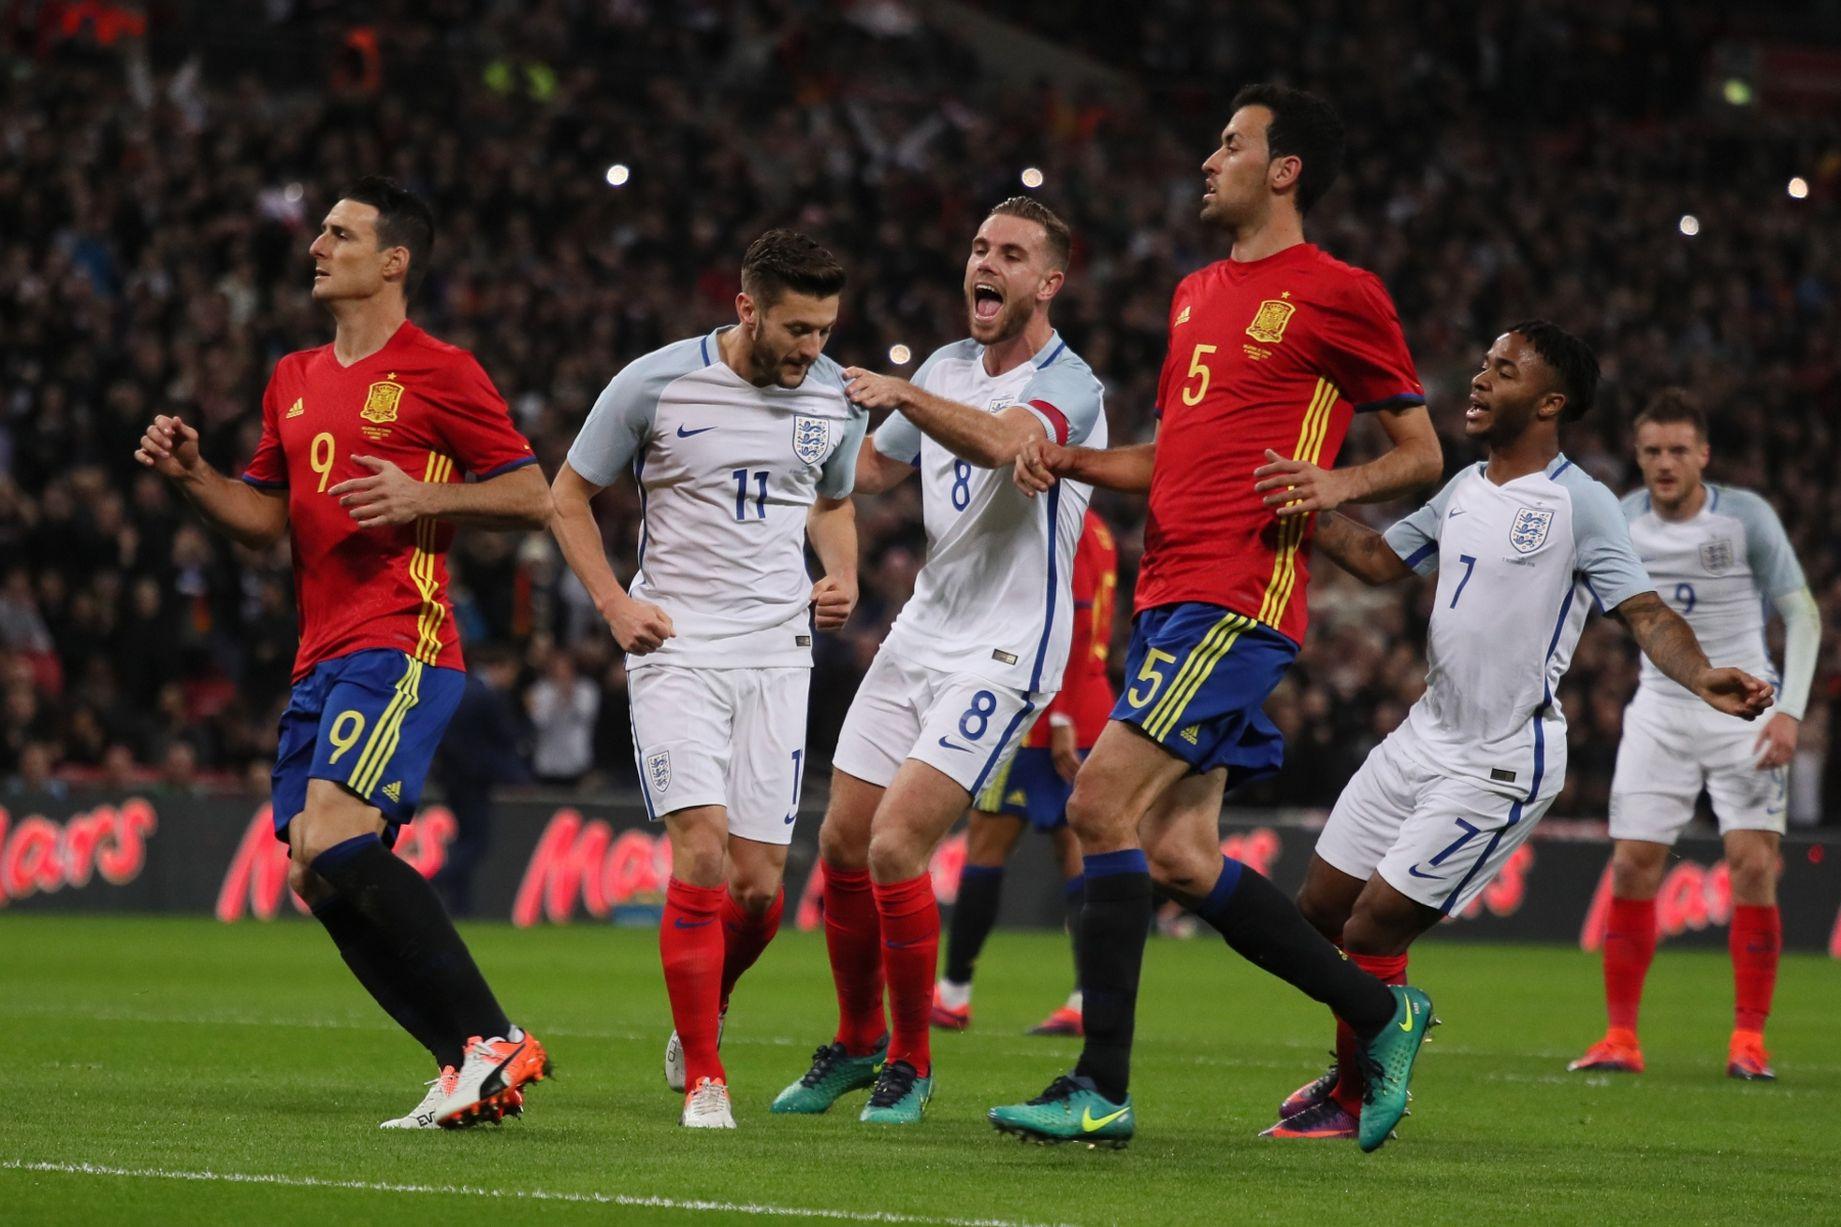 Angleterre Philippe Auclair C Est Une Tres Belle Rencontre Que